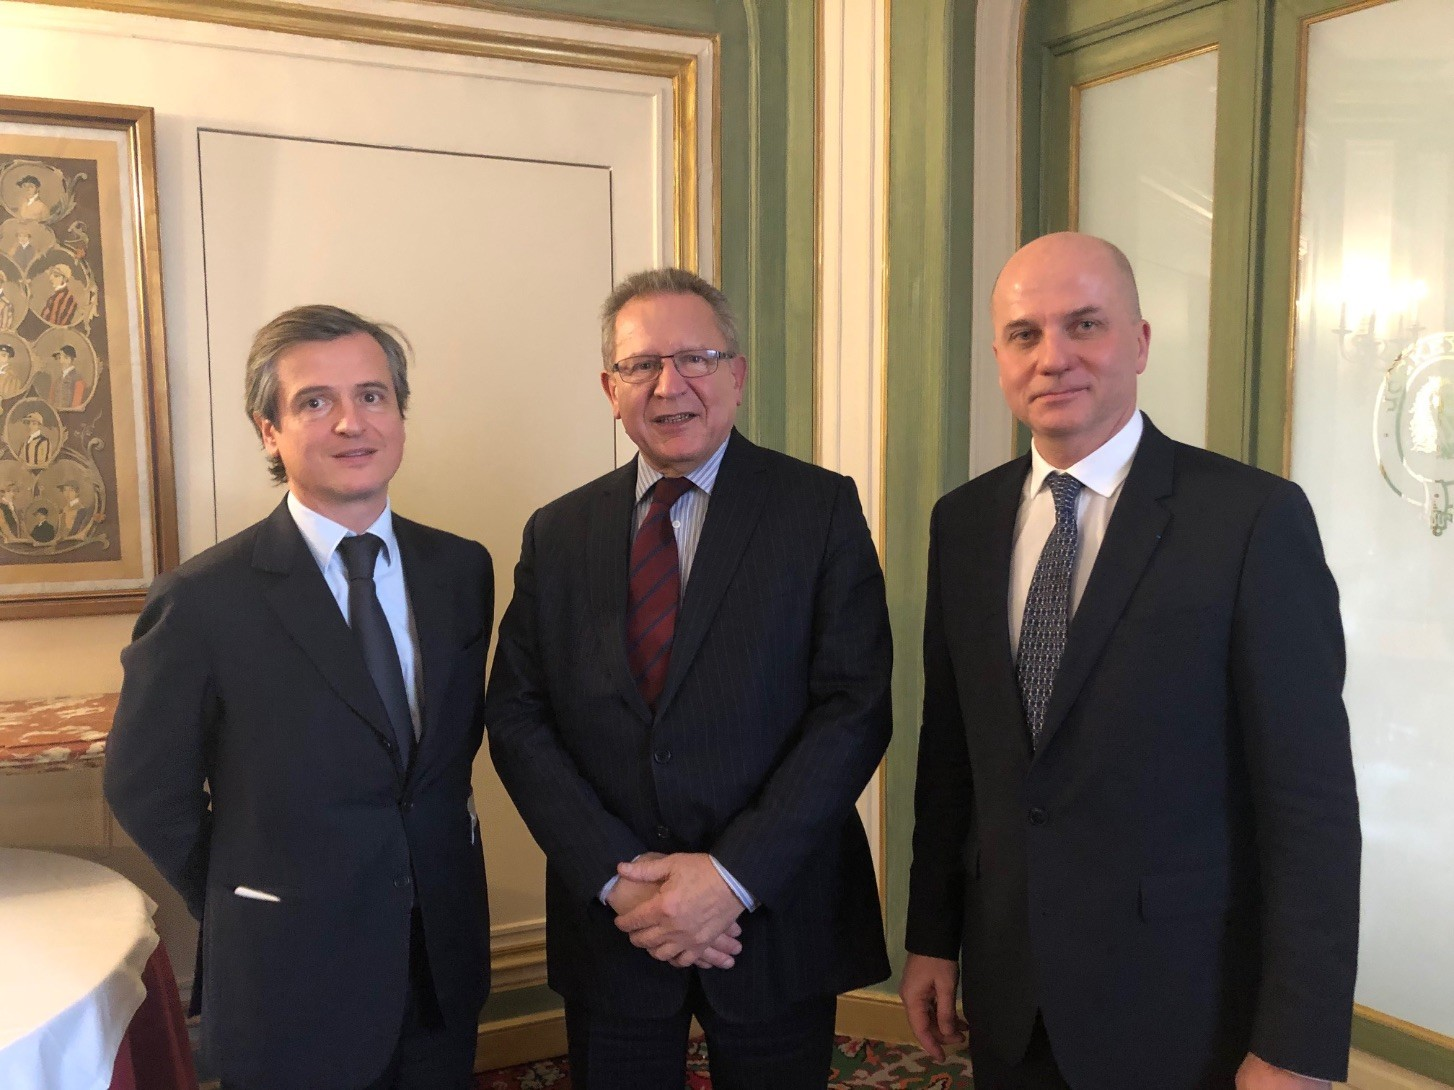 Jean-Guillaume d'Ornano réélu Président du SPEJP